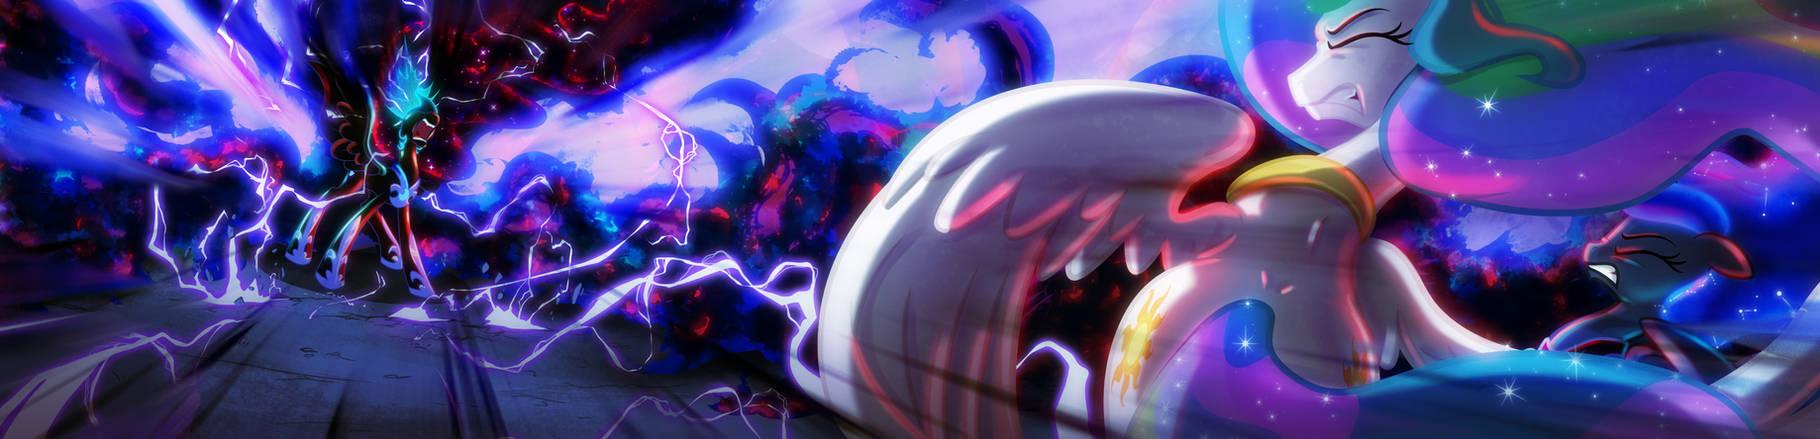 [Lumic4 - Lum and Light] Nightmare Moon Roar